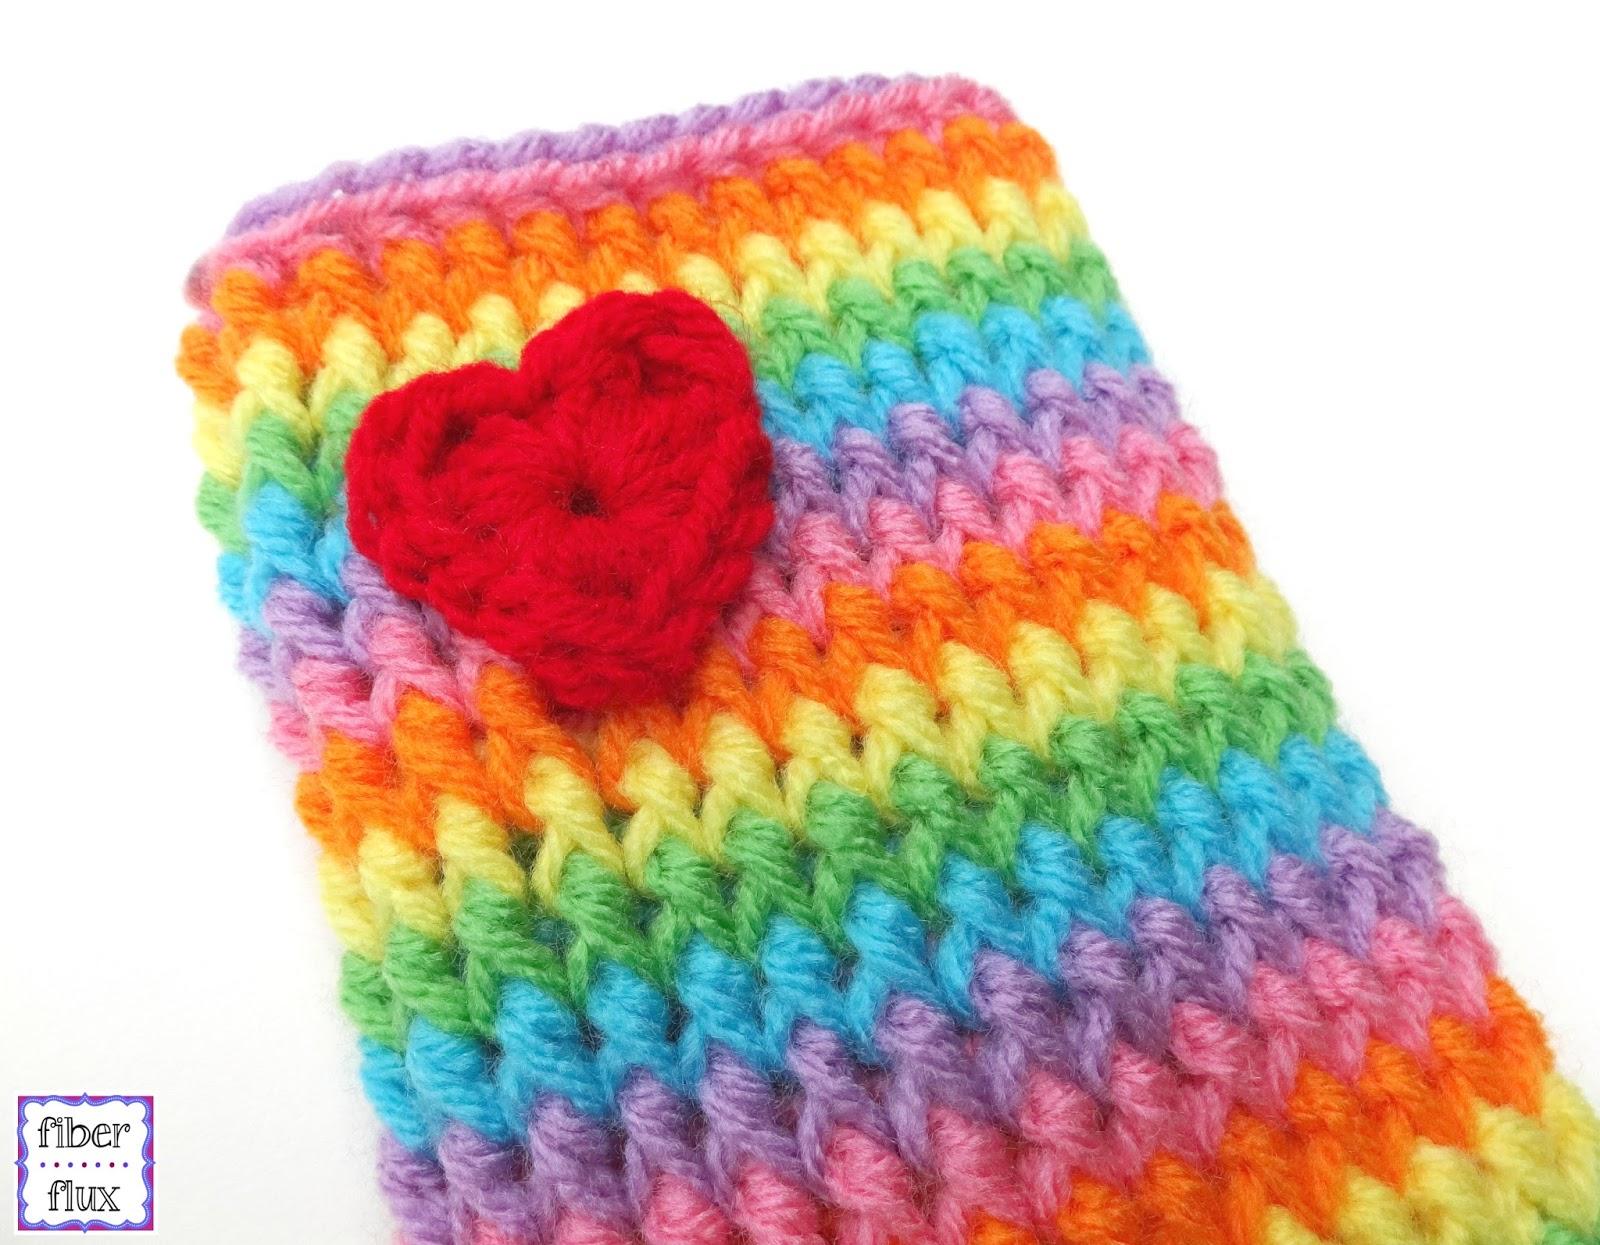 Fiber flux free crochet patternrainbow love legwarmers instructions for legwarmers bankloansurffo Choice Image